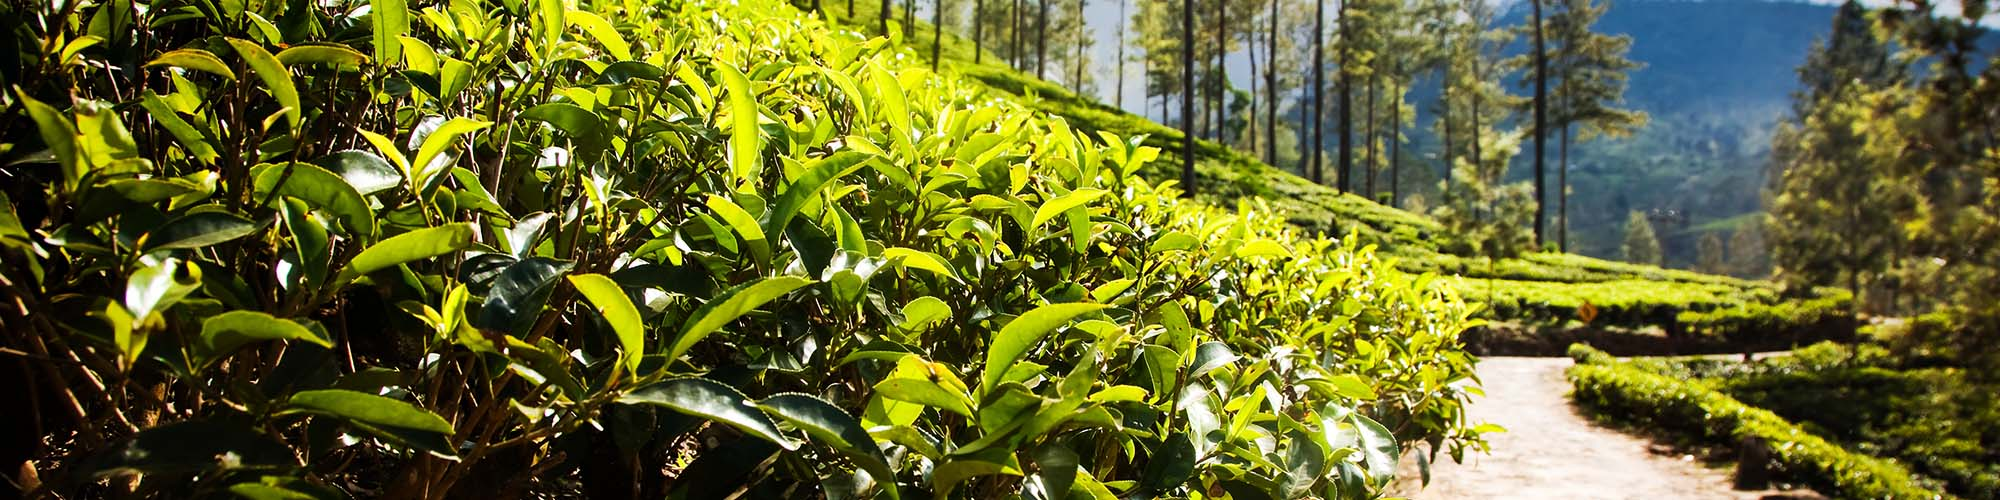 Teeplantagen Wanderung, Haputale, Sri Lanka